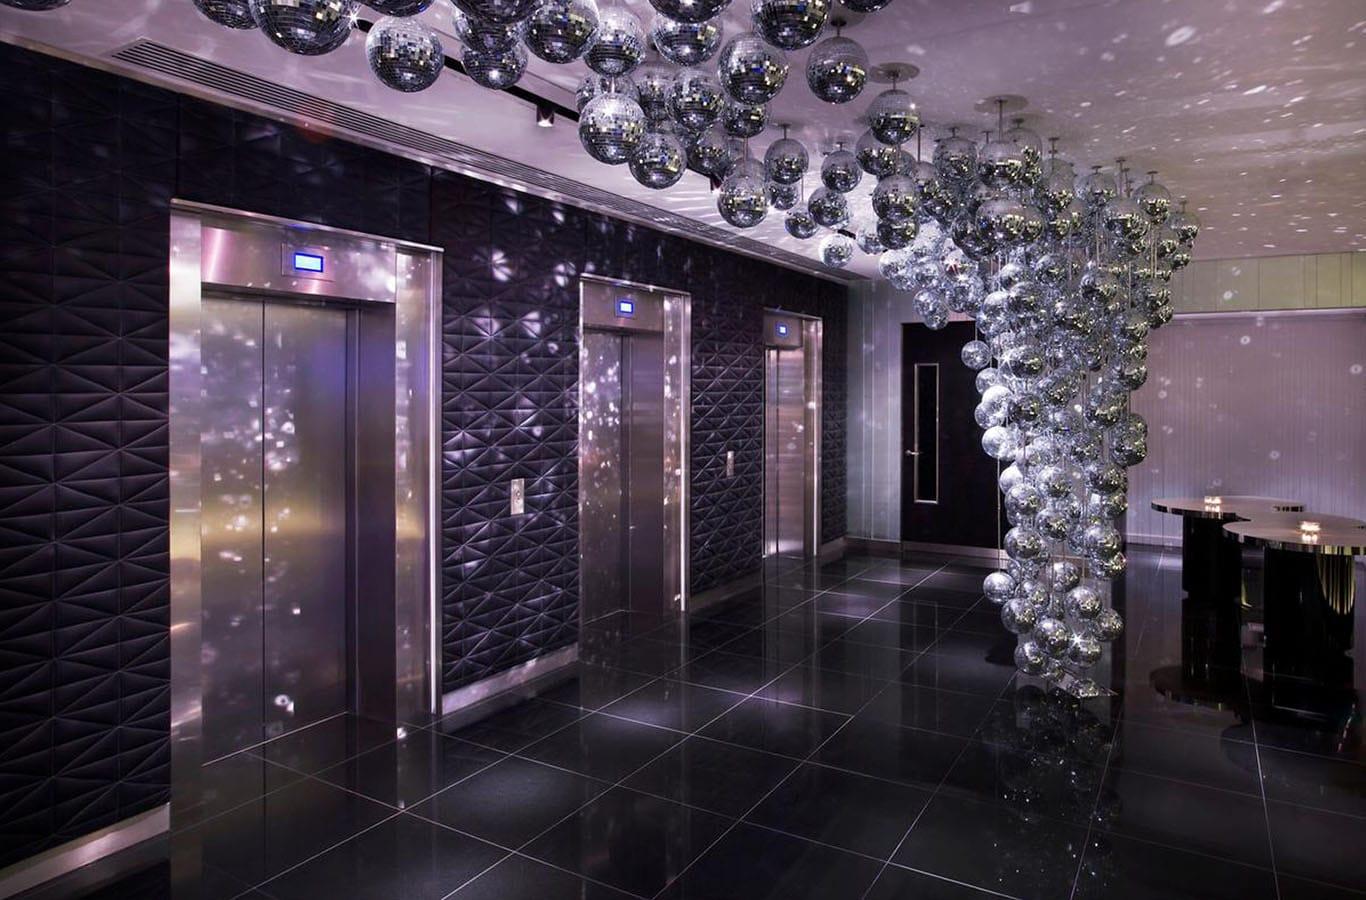 Polished Black Granite Tiles - The W Hotel Lift Lobby